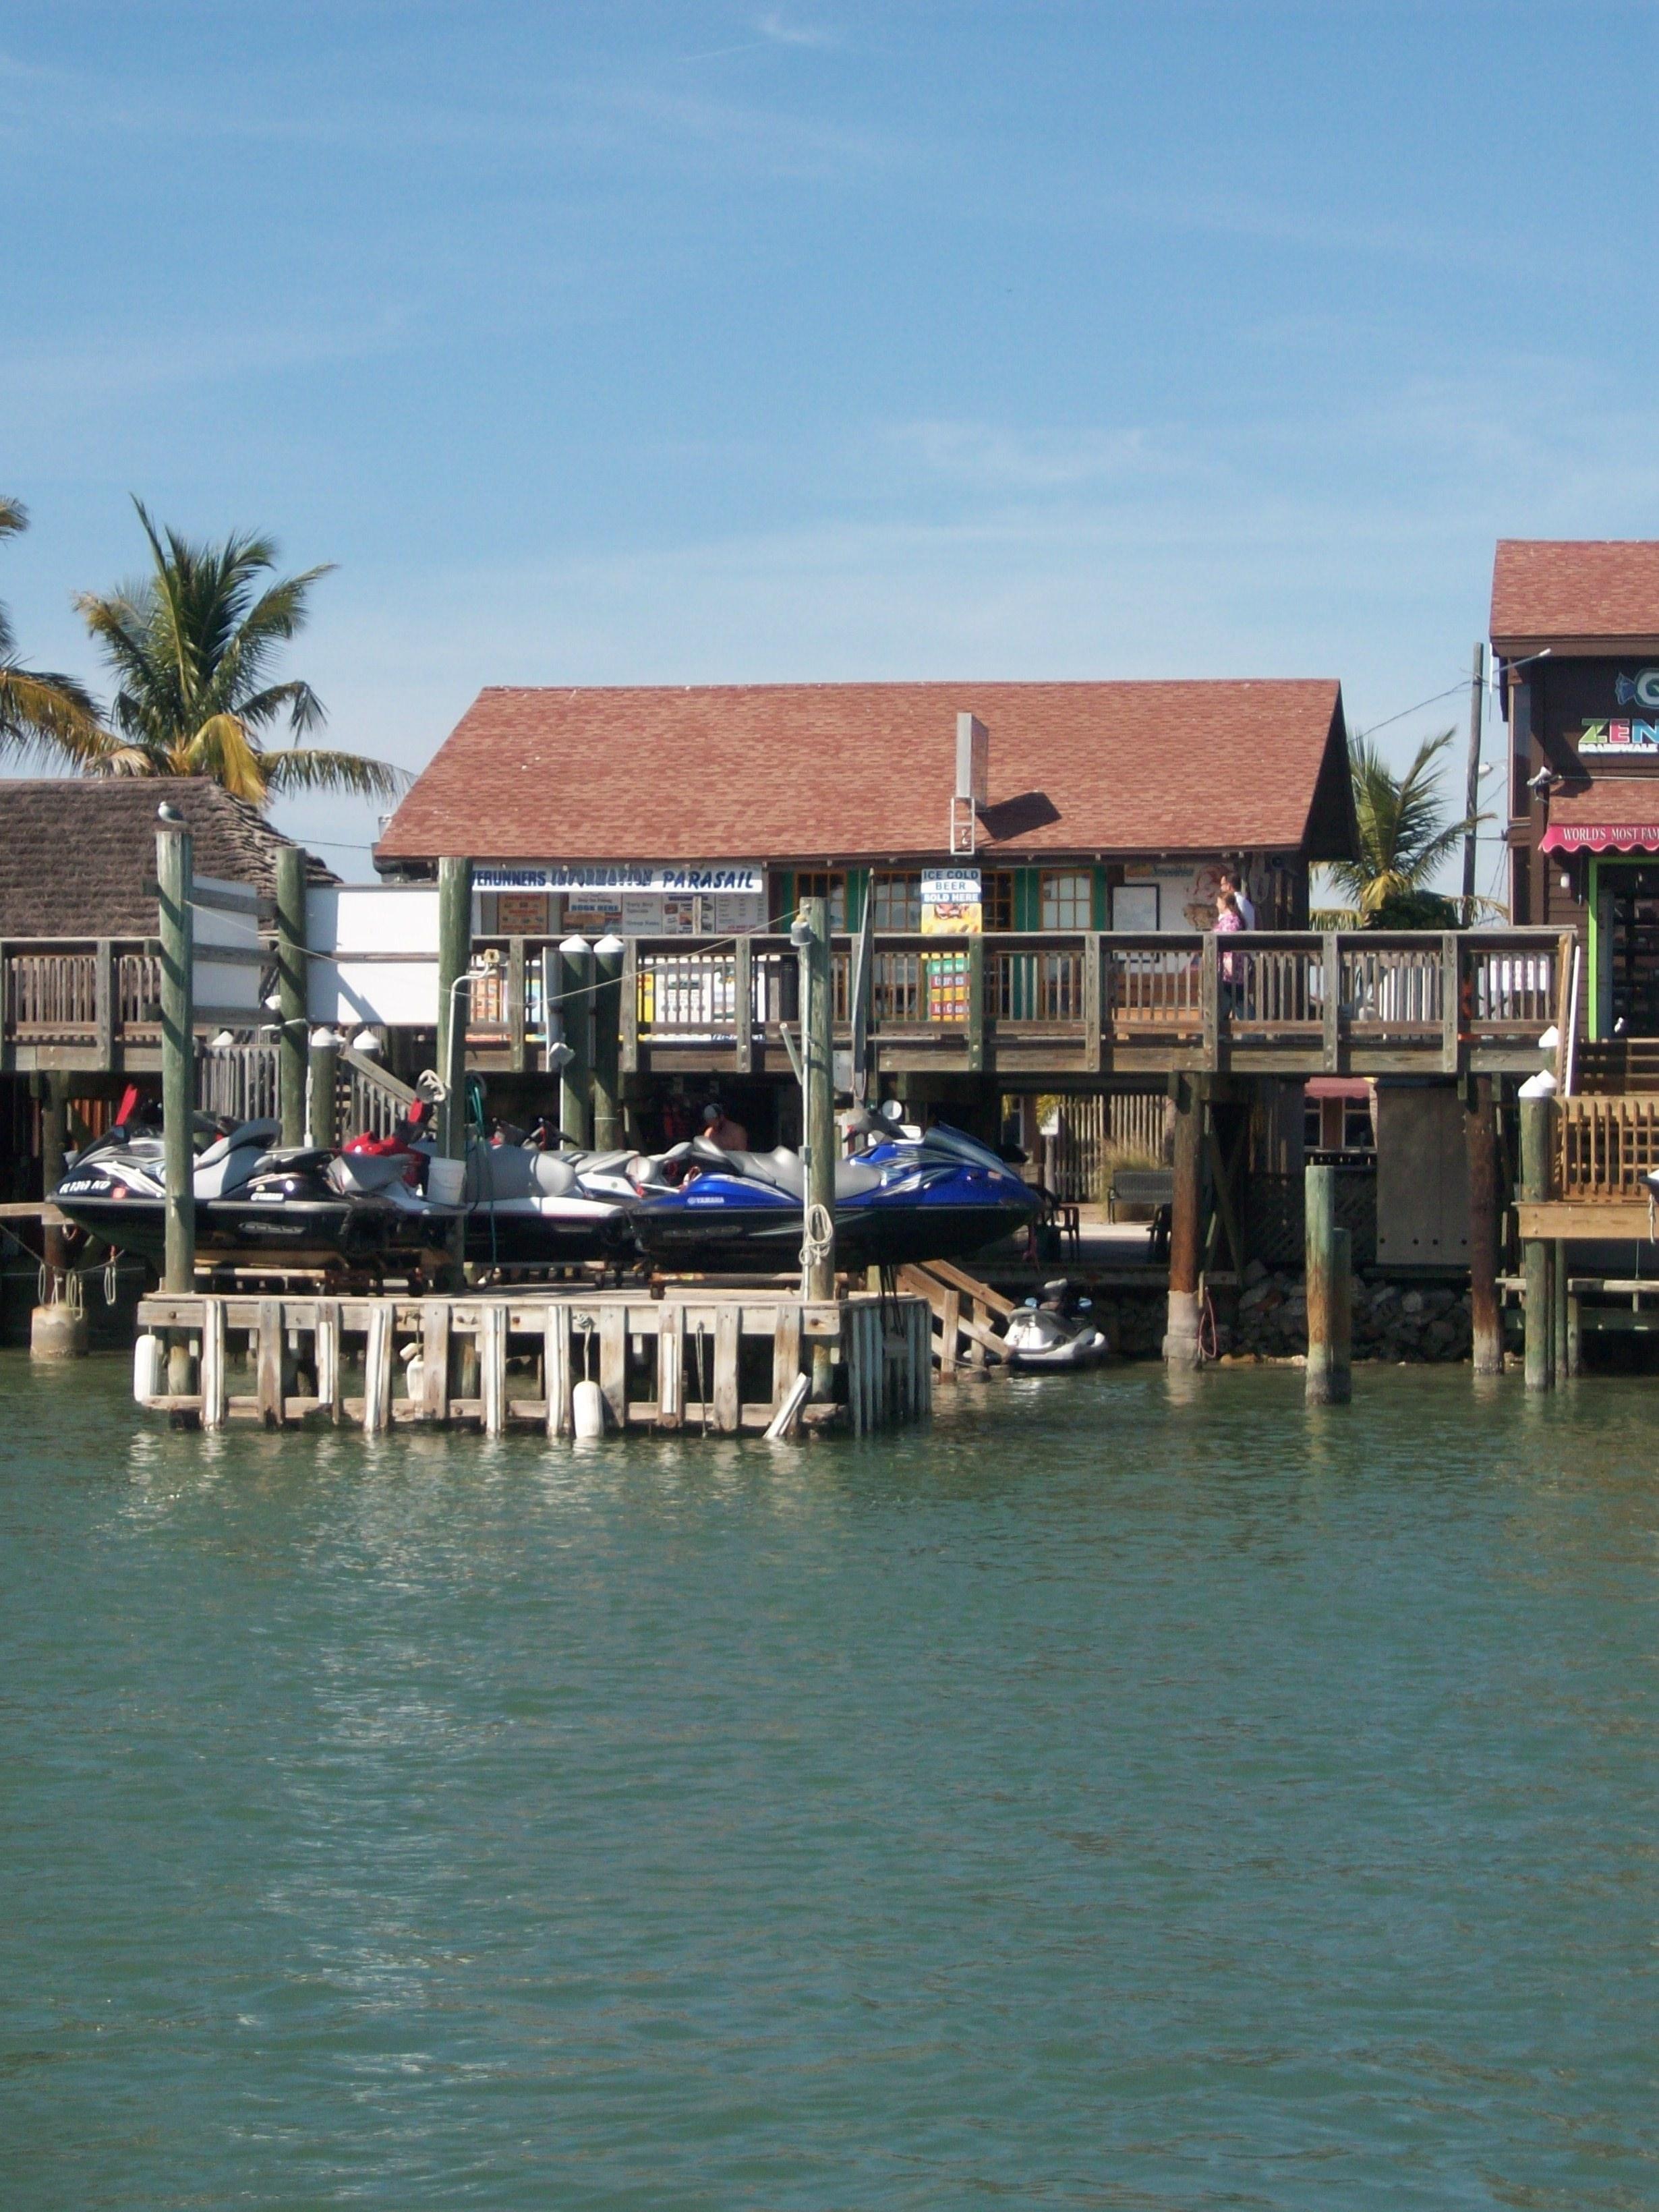 Waterside 205 Boardwalk Place E Madeira Beach, FL